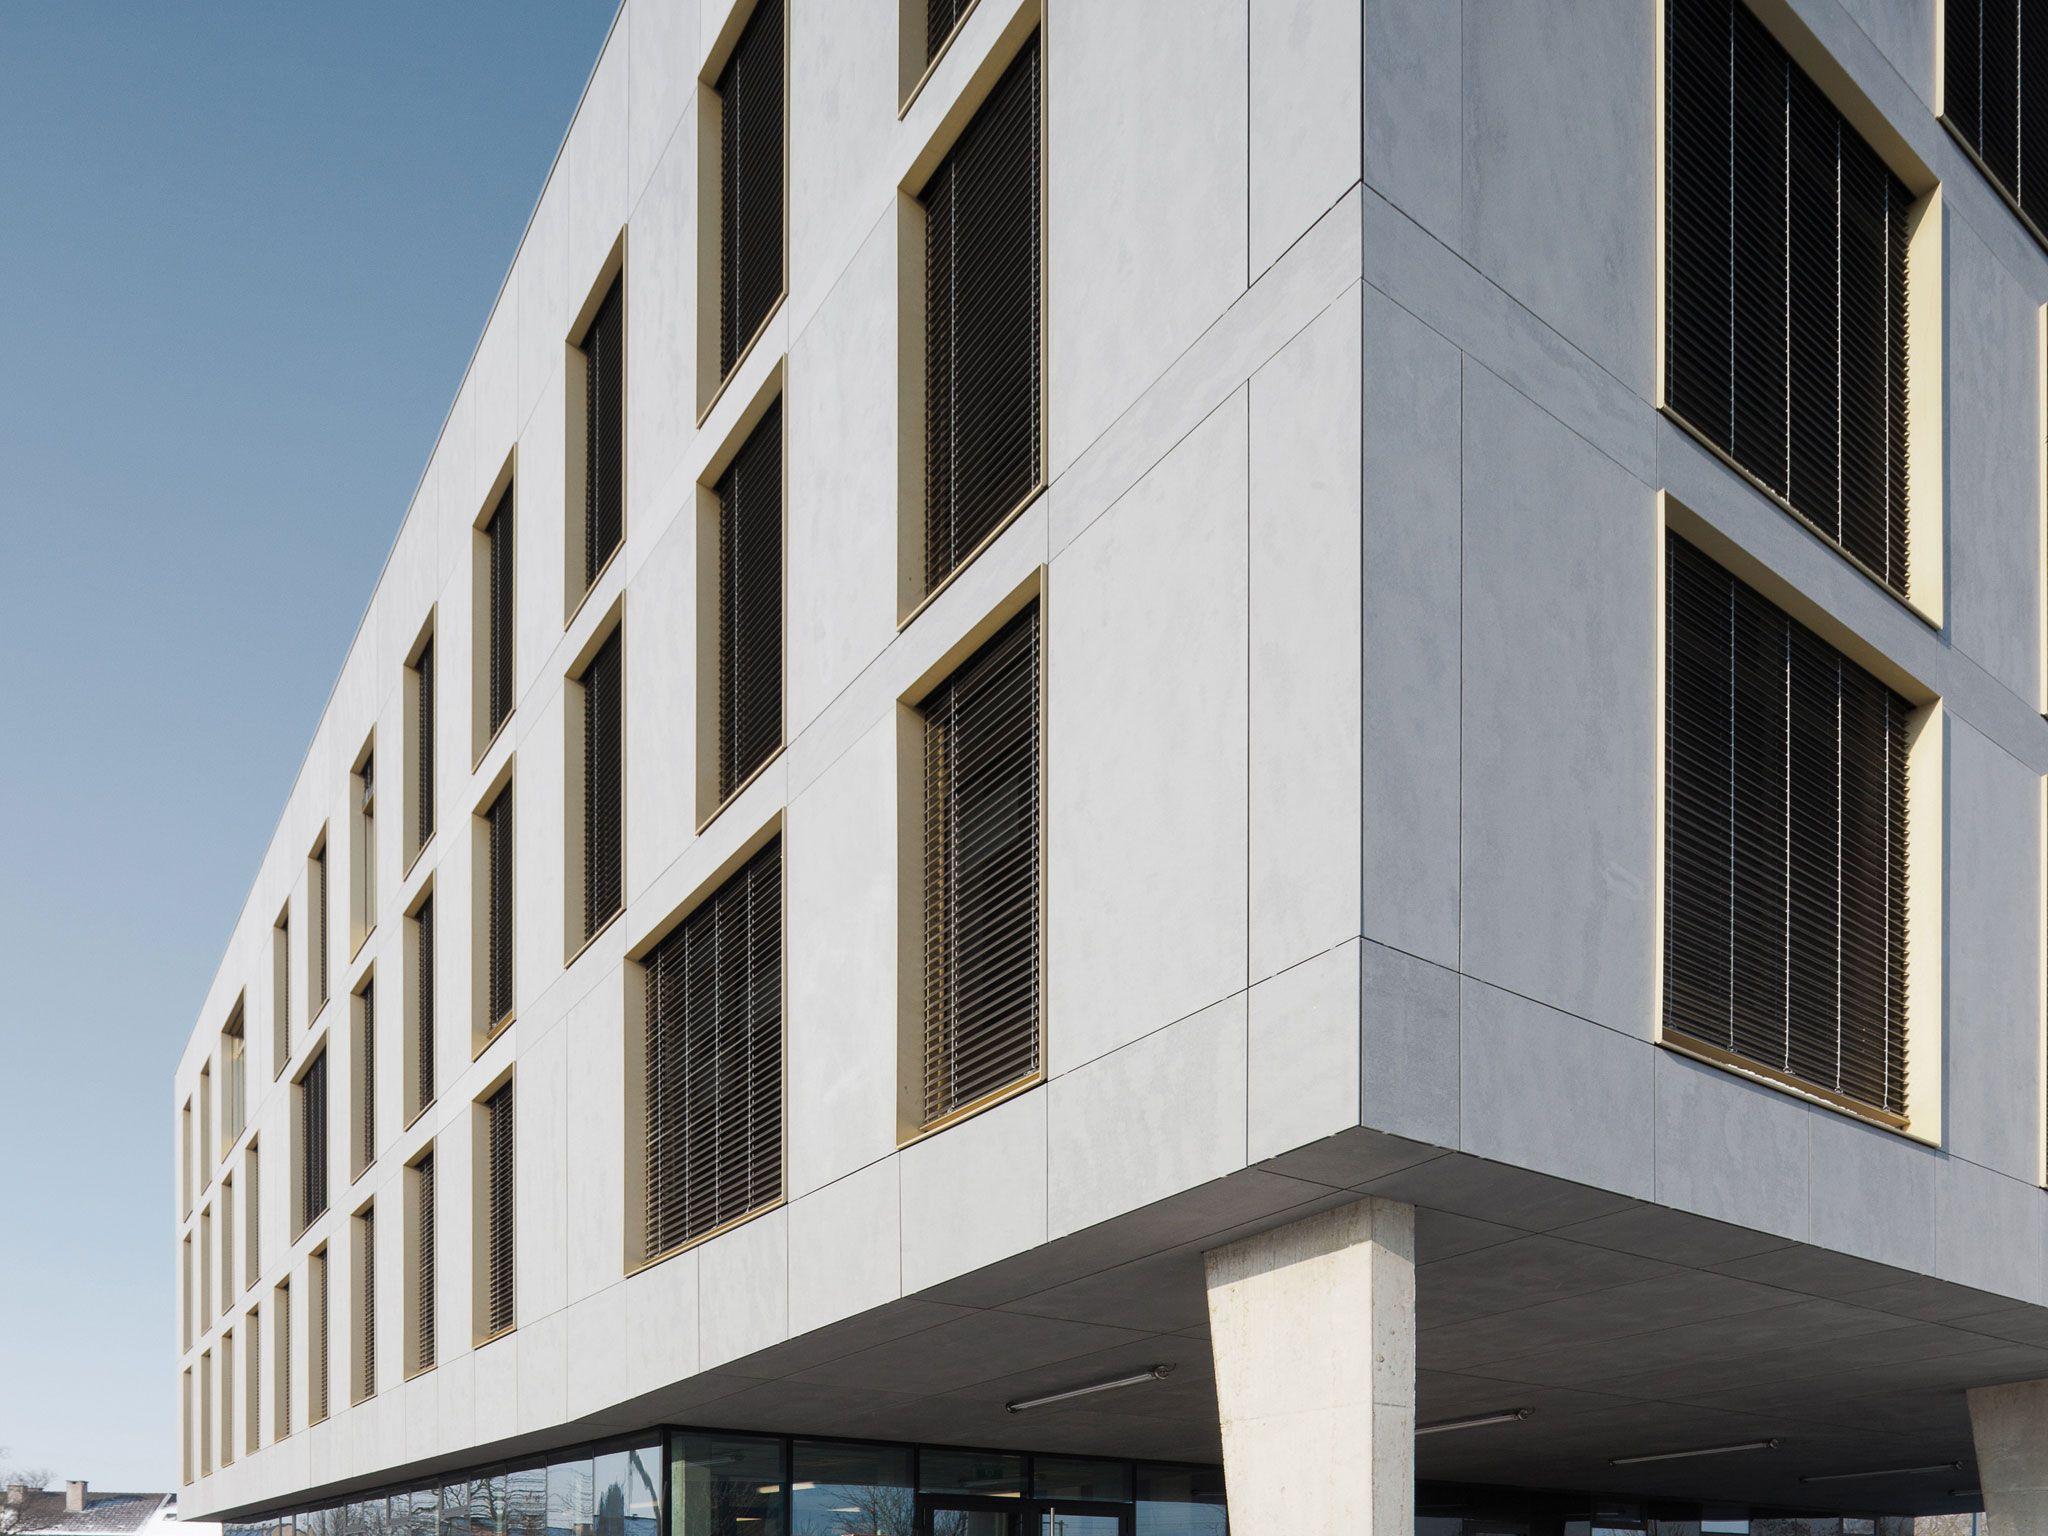 Concrete Building Facade : Equitone facade panels belgium hasselt office